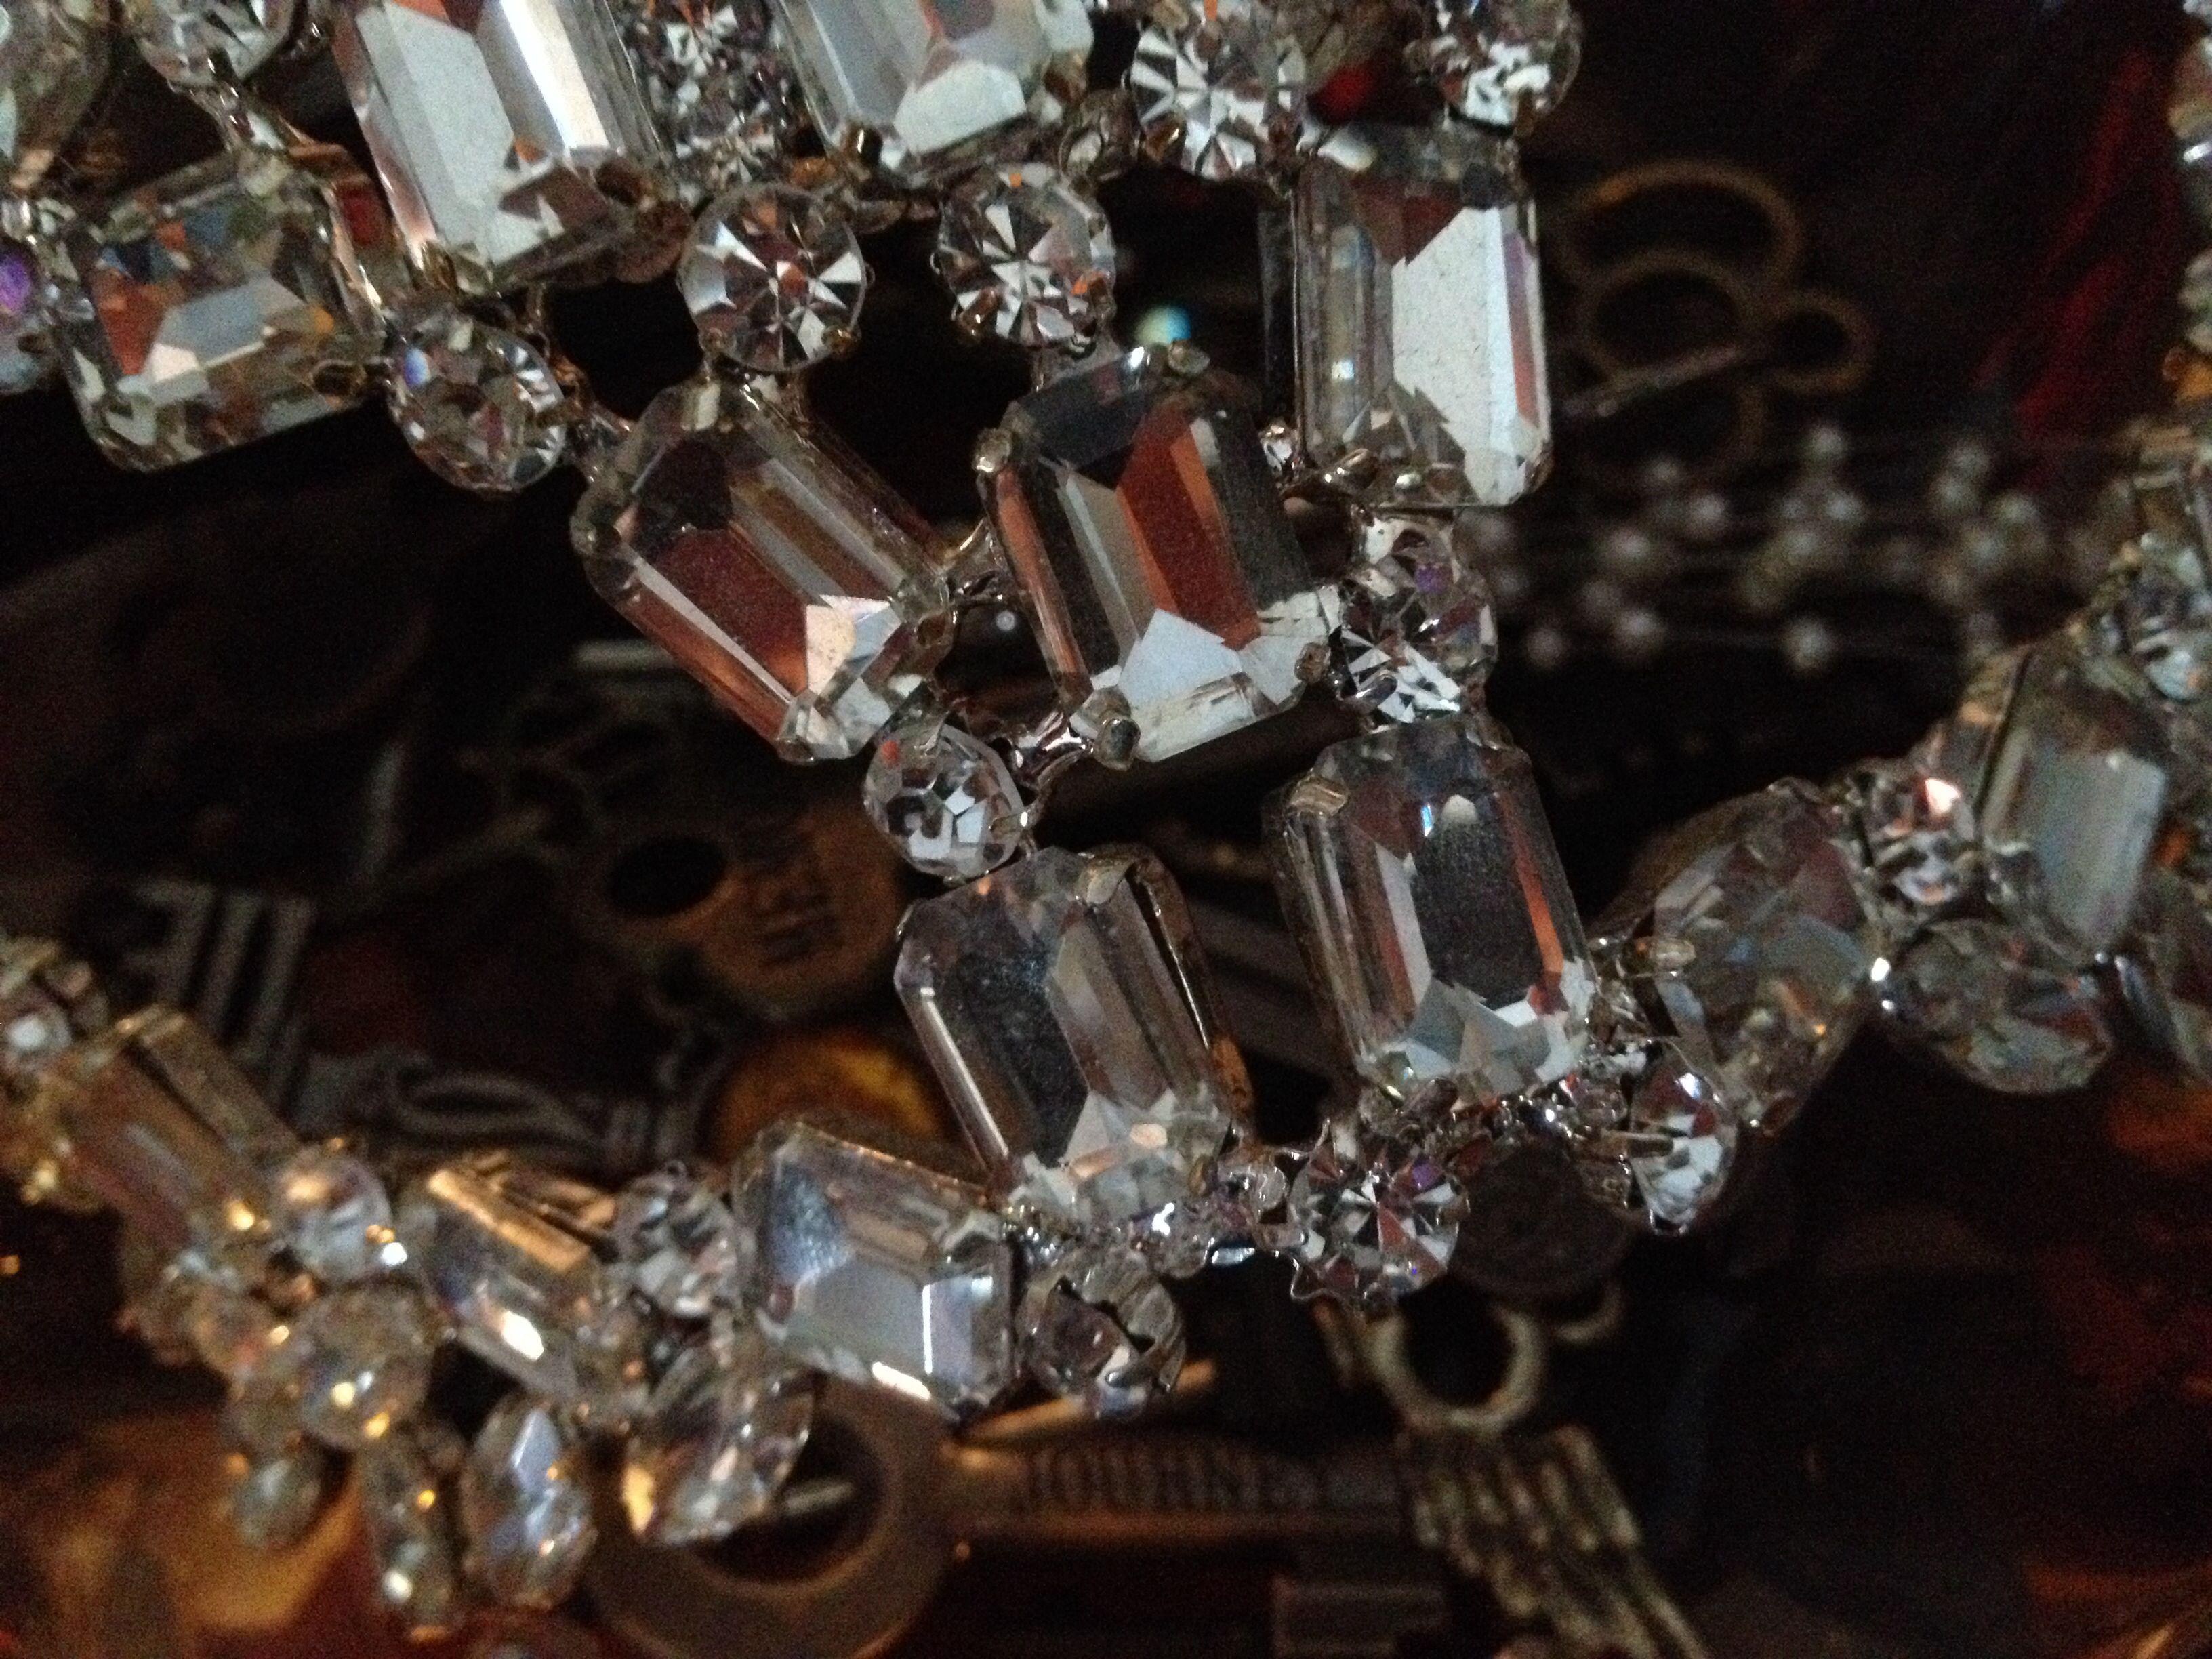 My Mask of Diamonds resting upon my Chalice of Keys